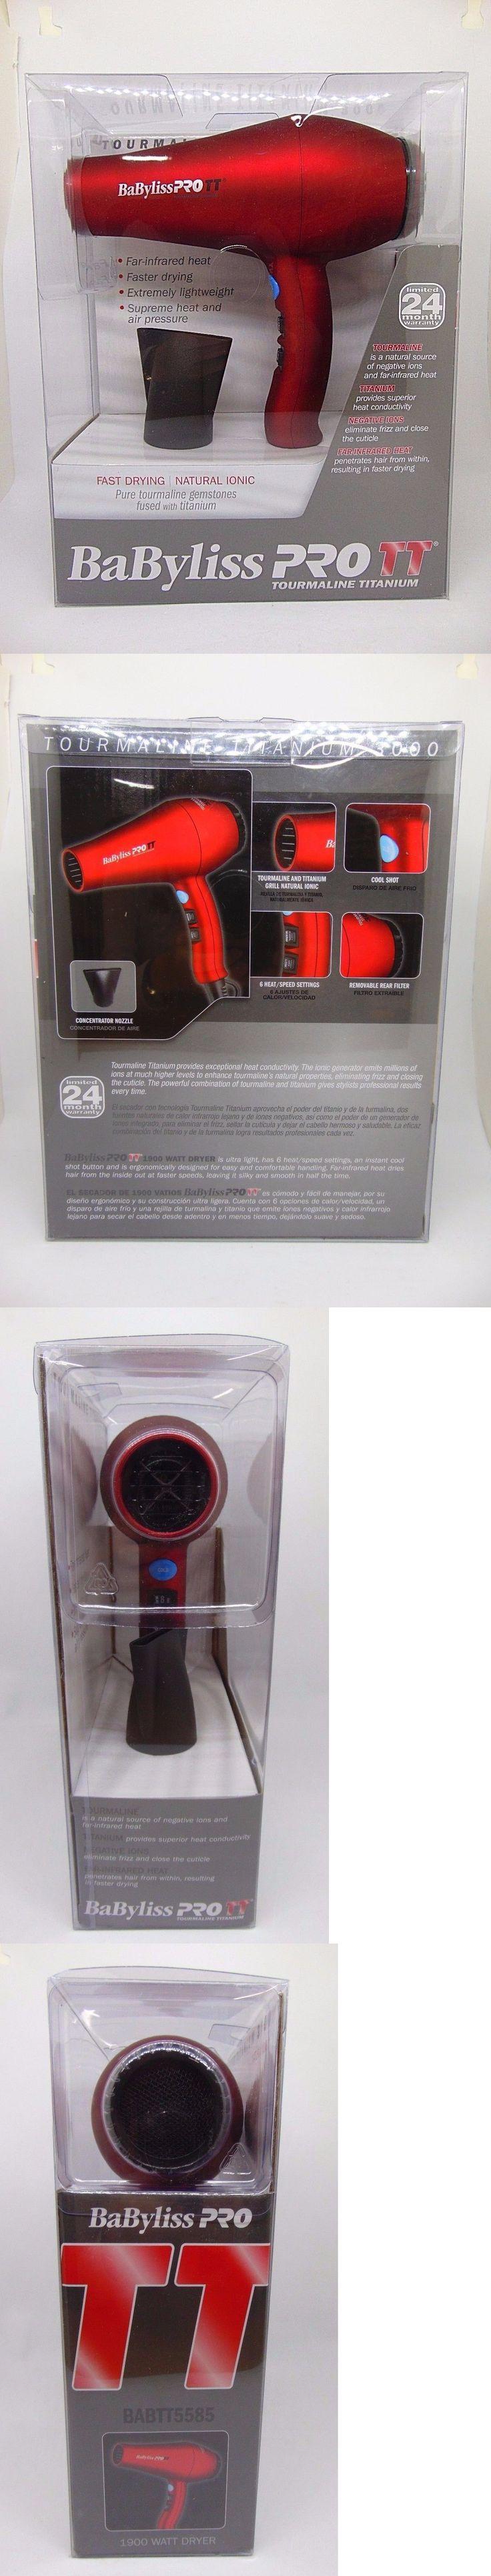 Hair Dryers: Babyliss Pro Tt Tourmaline Titanium 3000 Dryer Babtt5585 New! -> BUY IT NOW ONLY: $69.9 on eBay!